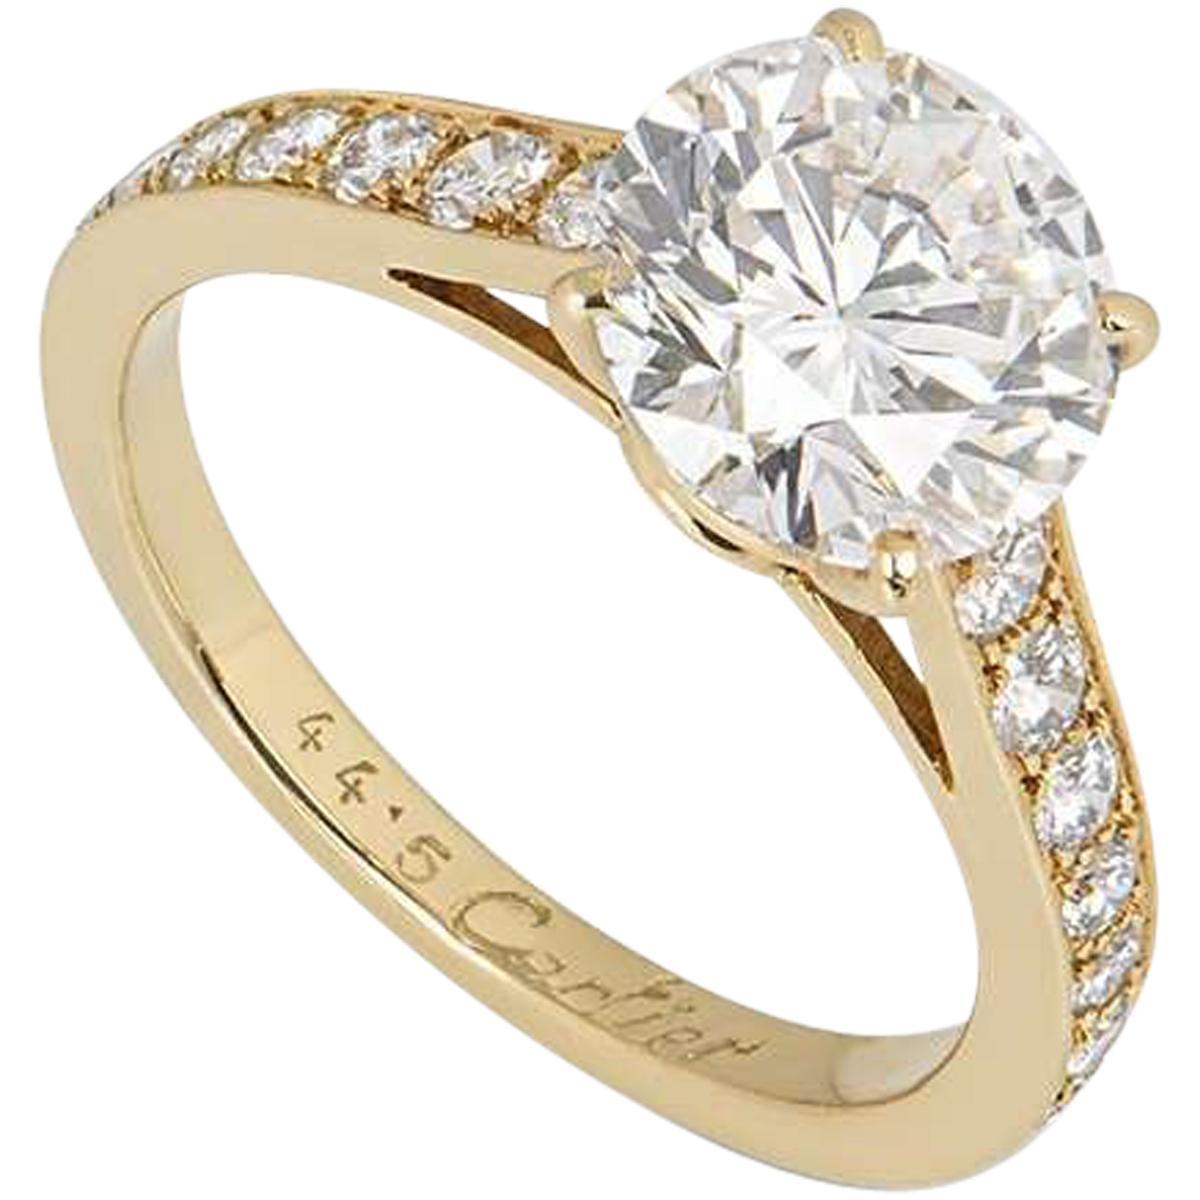 Cartier Solitaire 1895 Diamond Engagement Ring 2.02 Carat D/VS1 GIA Certified